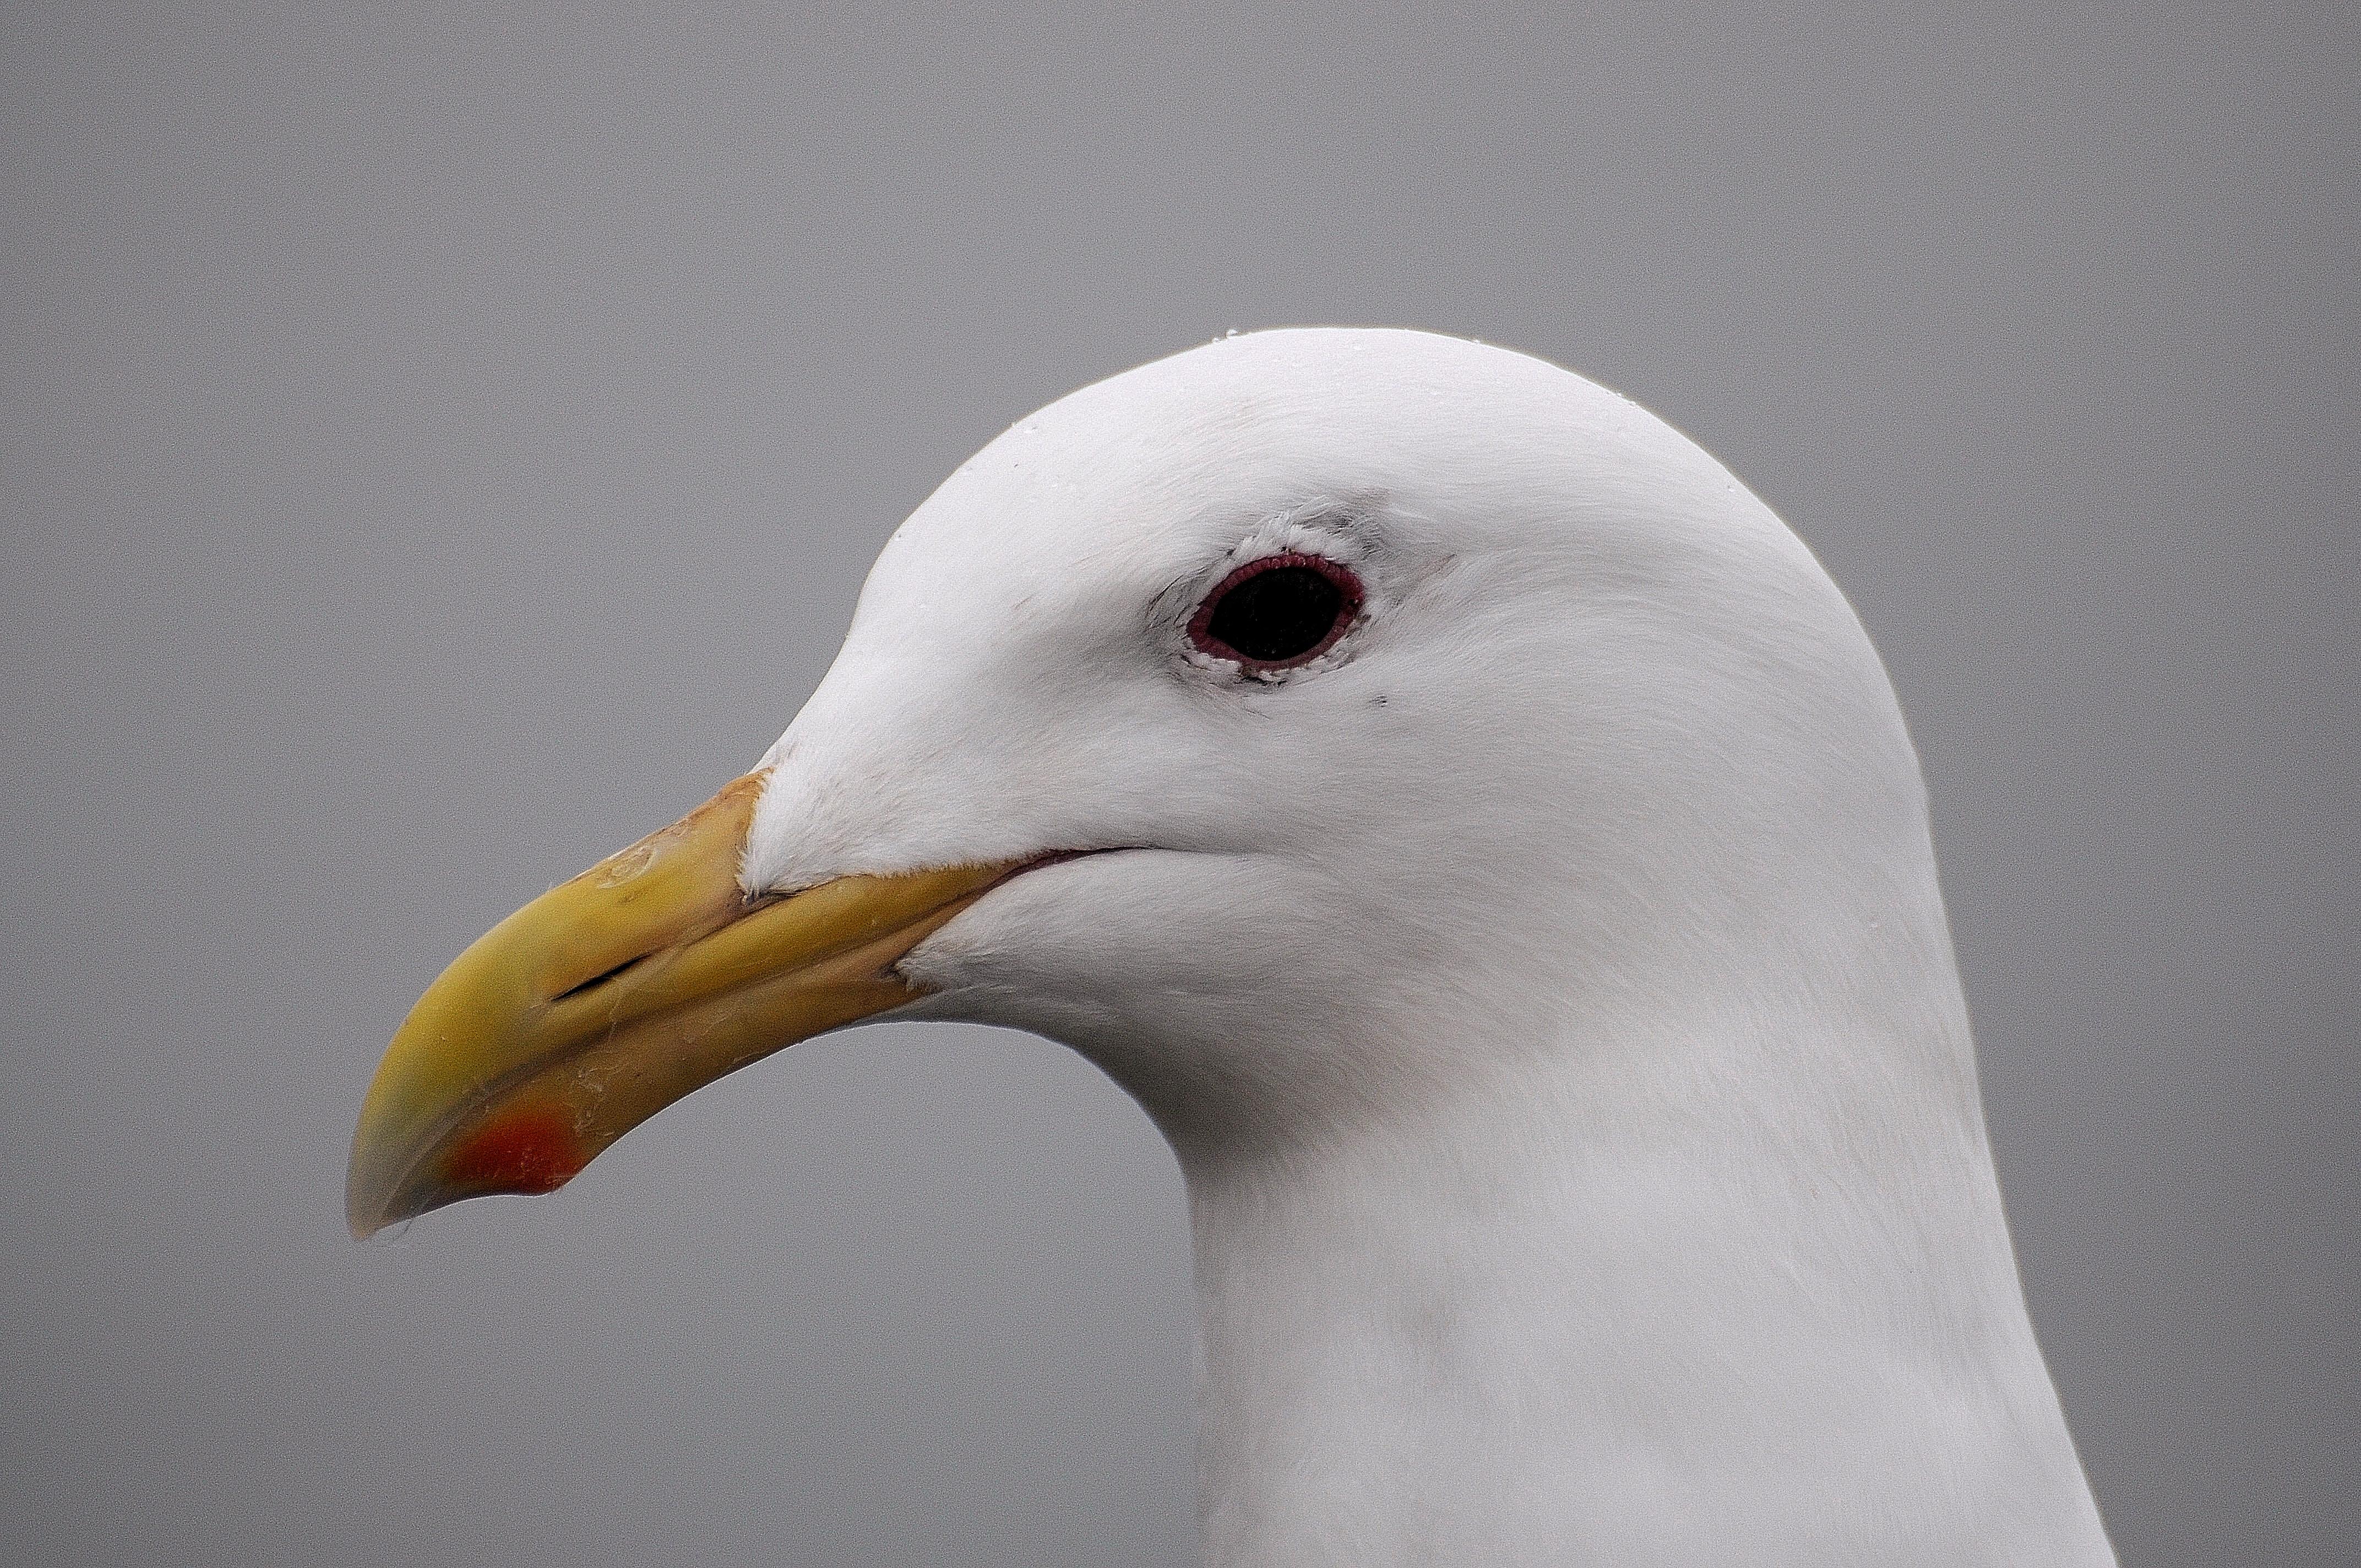 Galaucous-winged gull                          Photo: Joe Meche